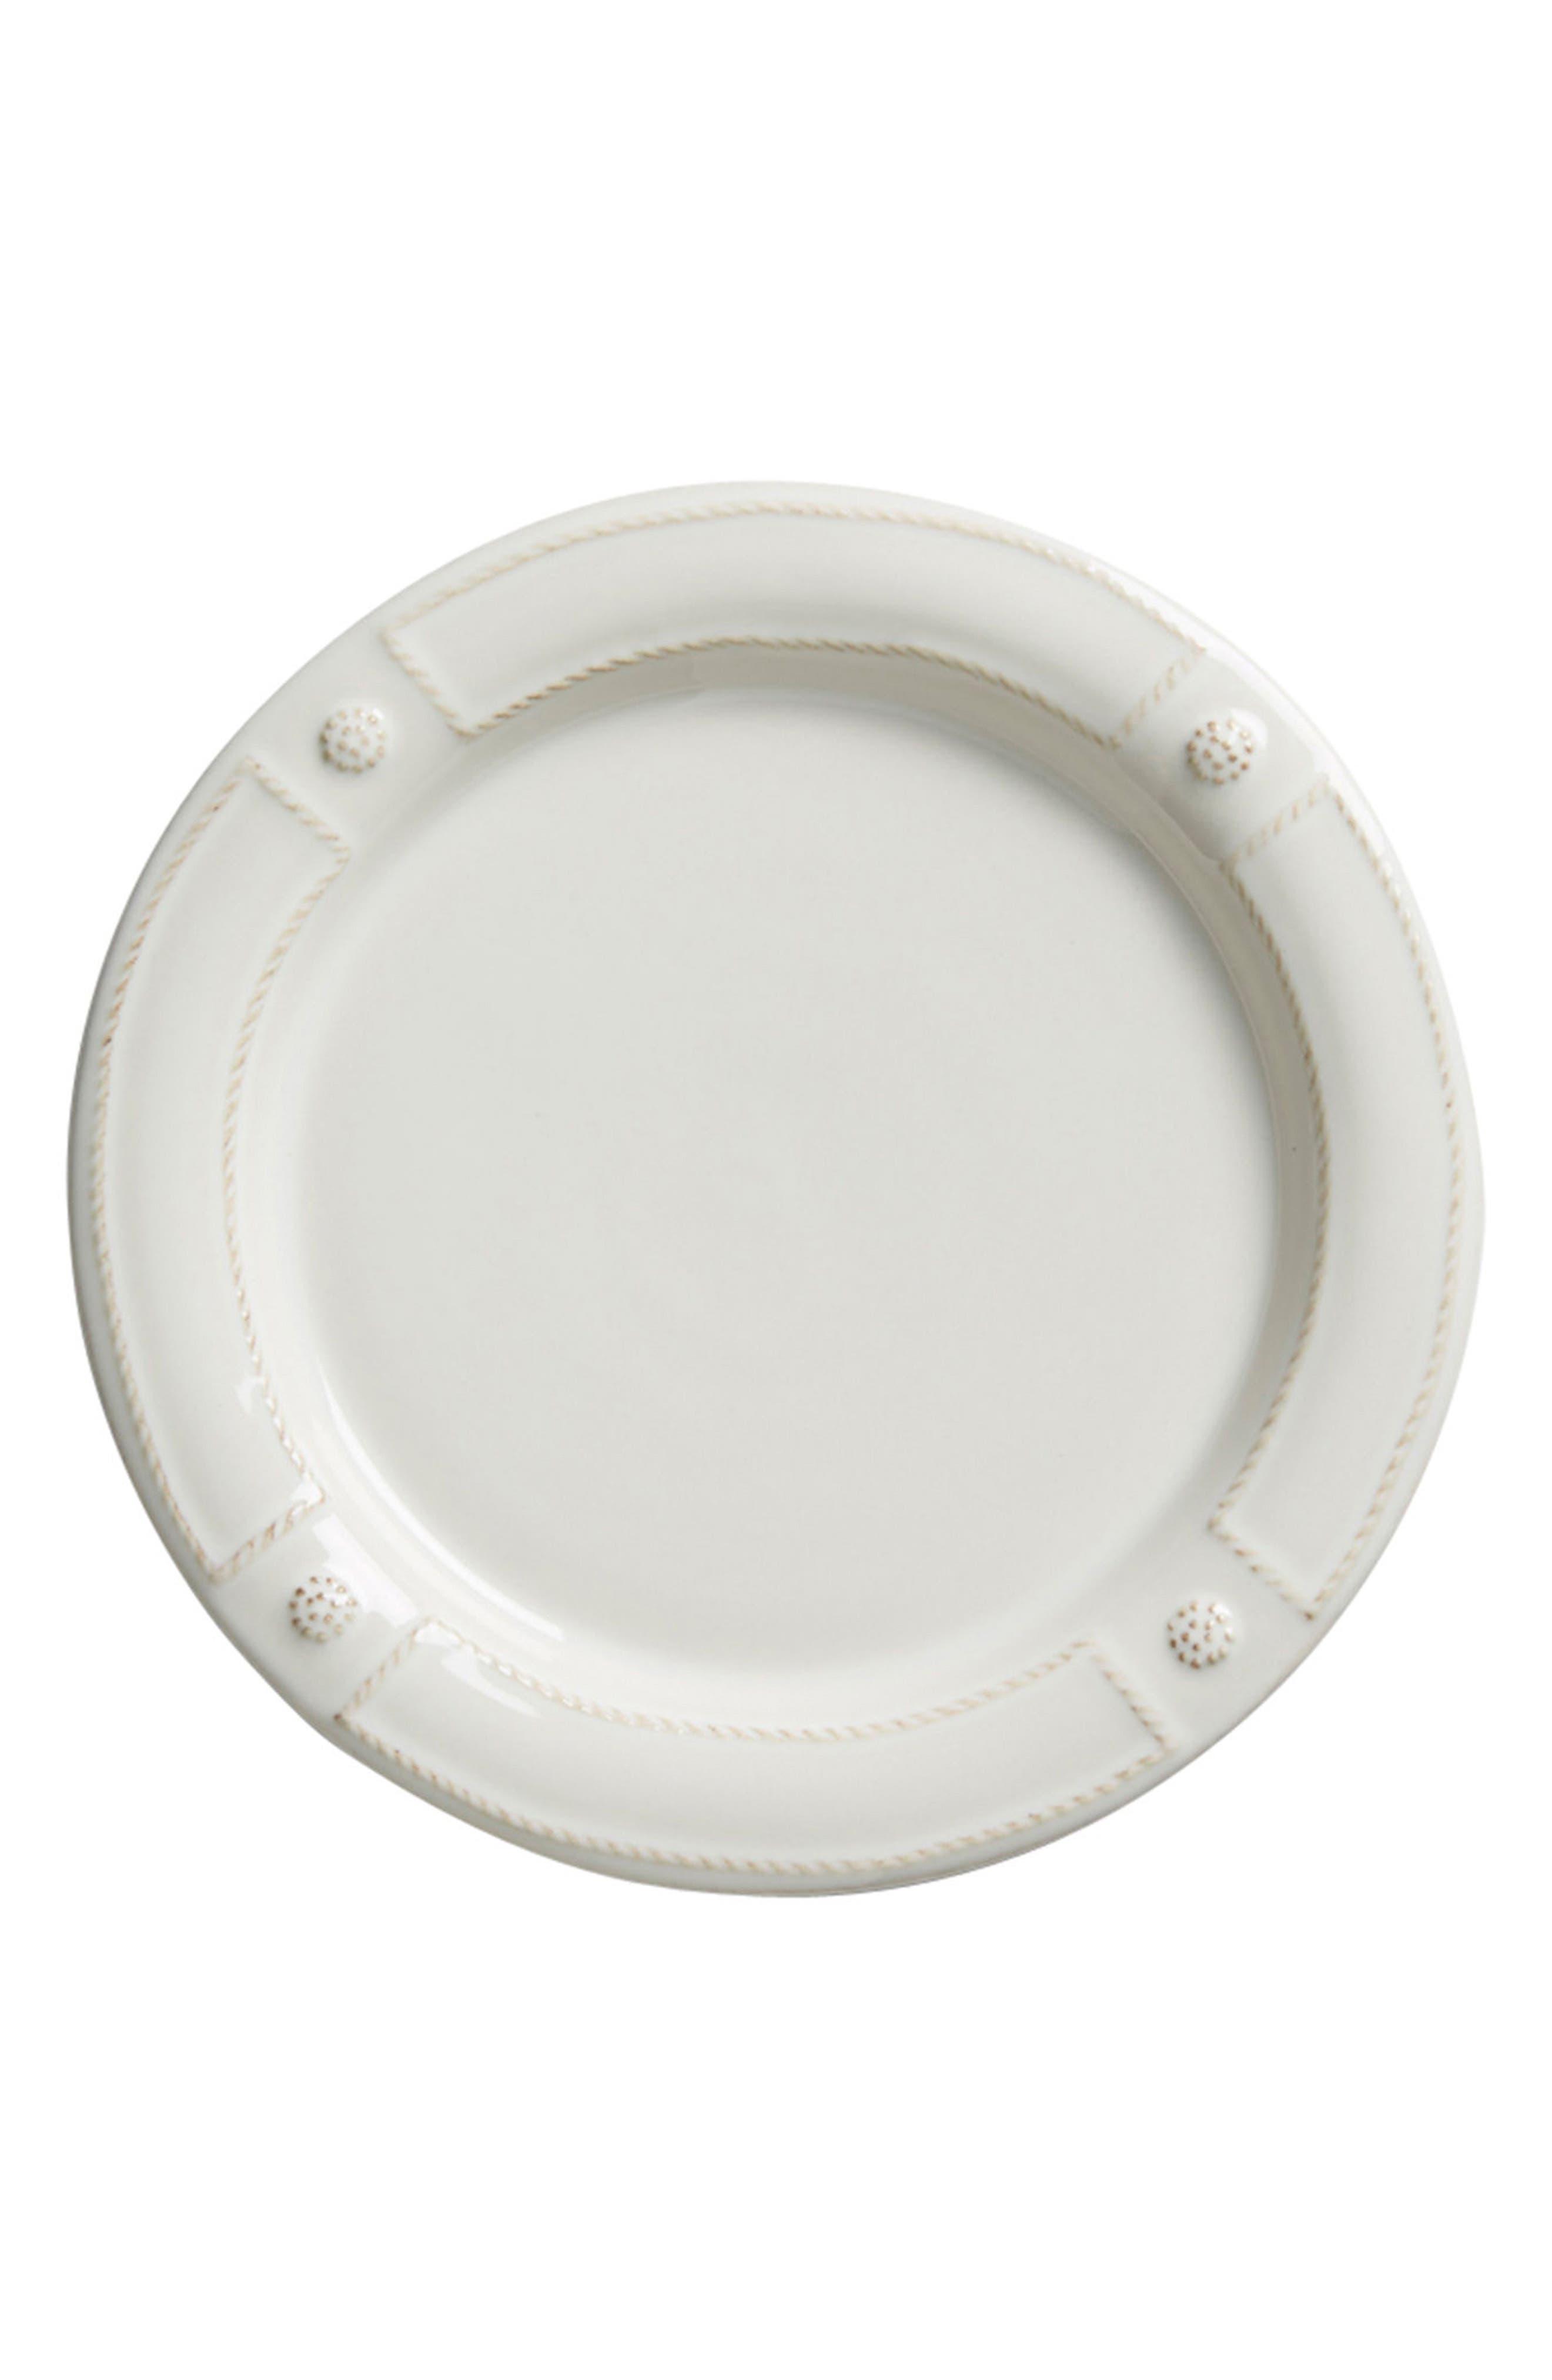 Juliska Berry & Thread French Panel Ceramic Salad Plate